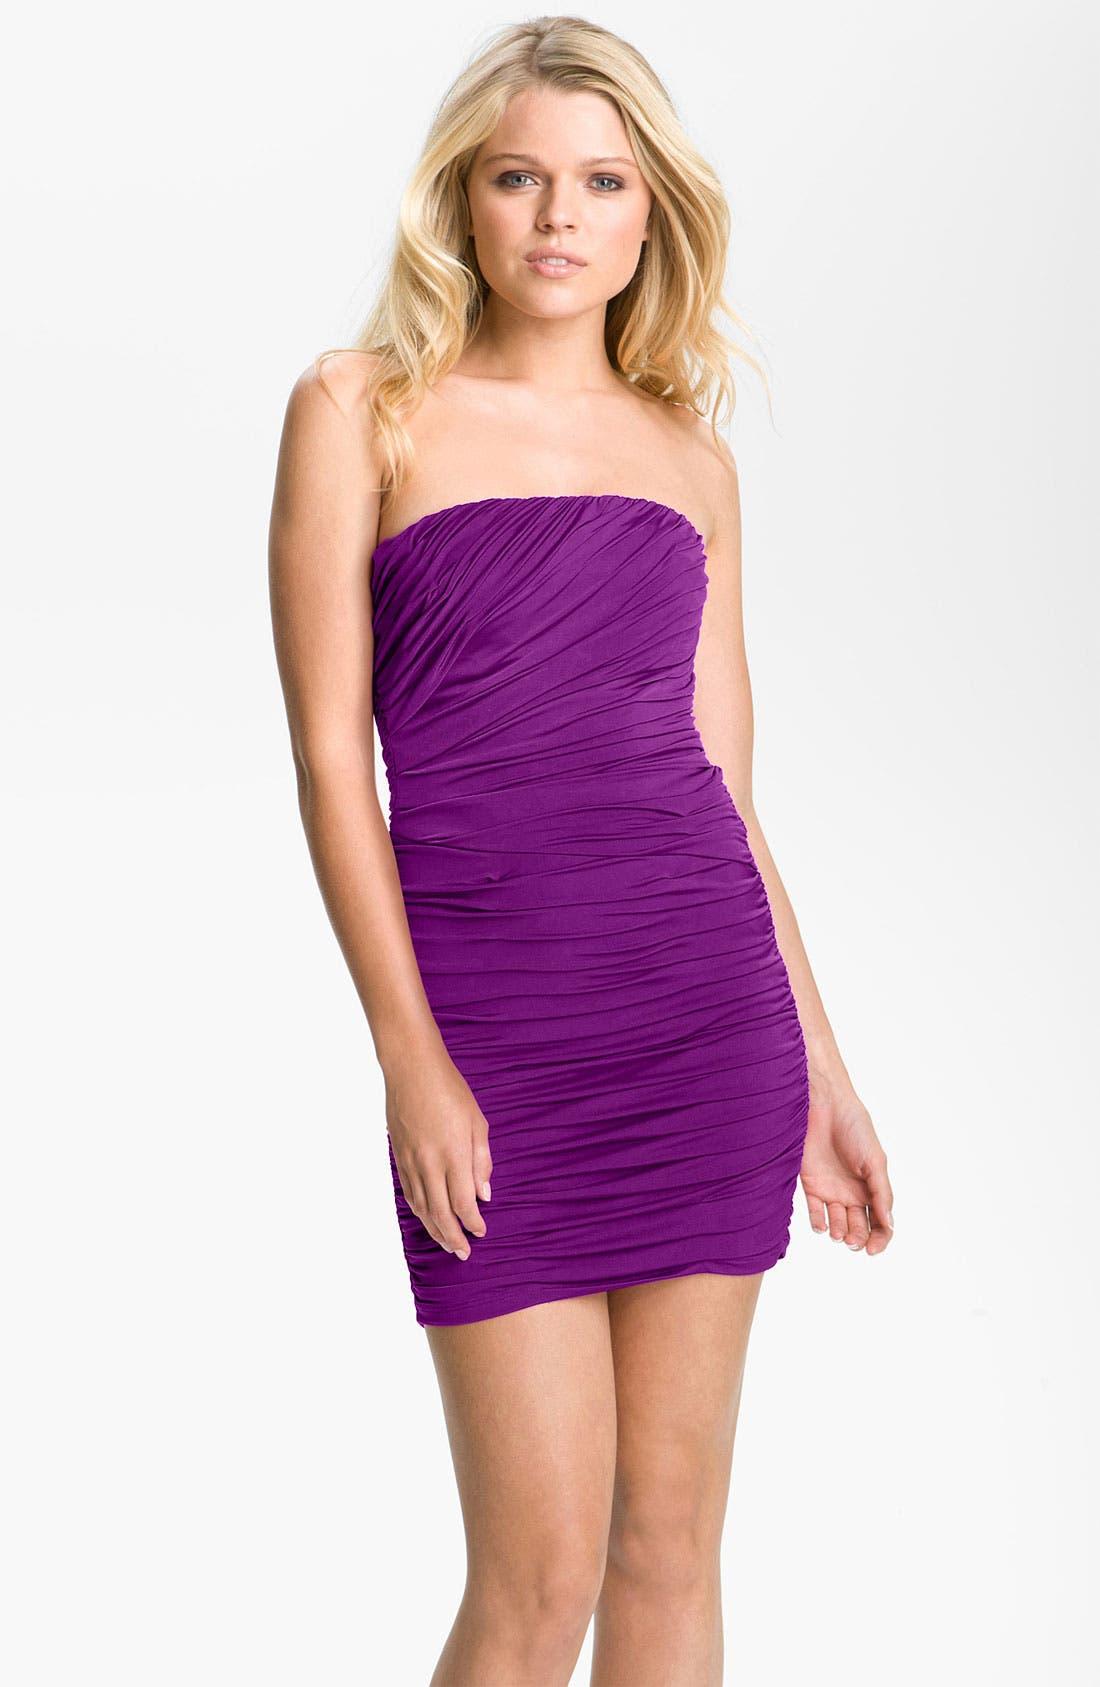 Main Image - Jessica McClintock Strapless Ruched Minidress